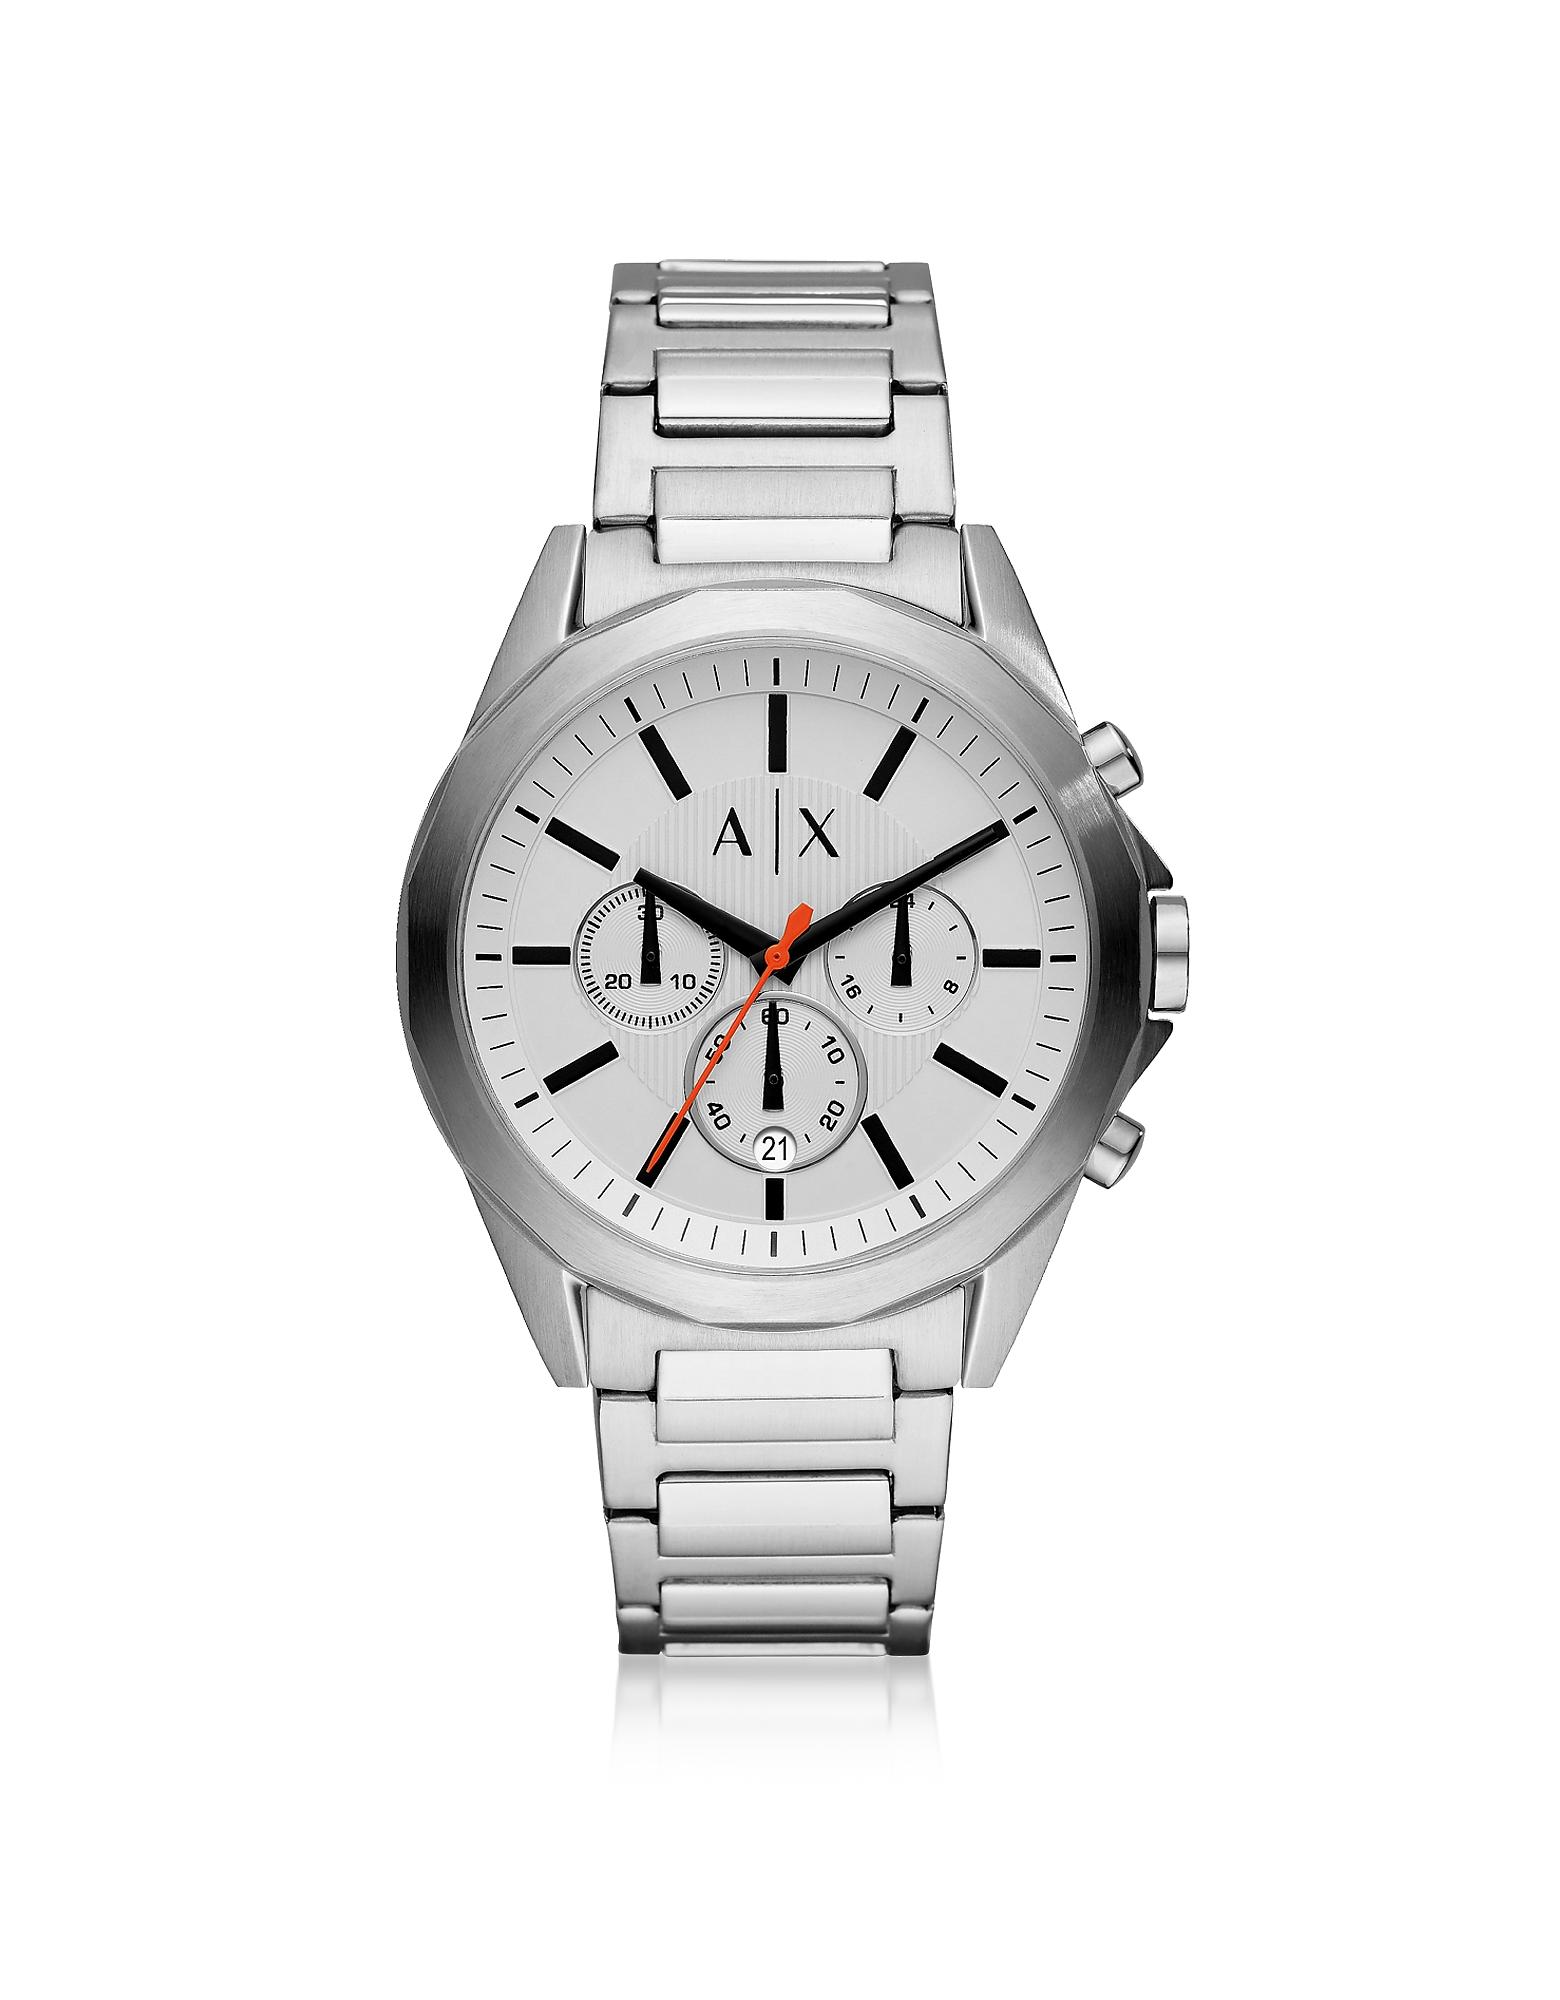 Drexler Stainless Steel Men's Chronograph Watch